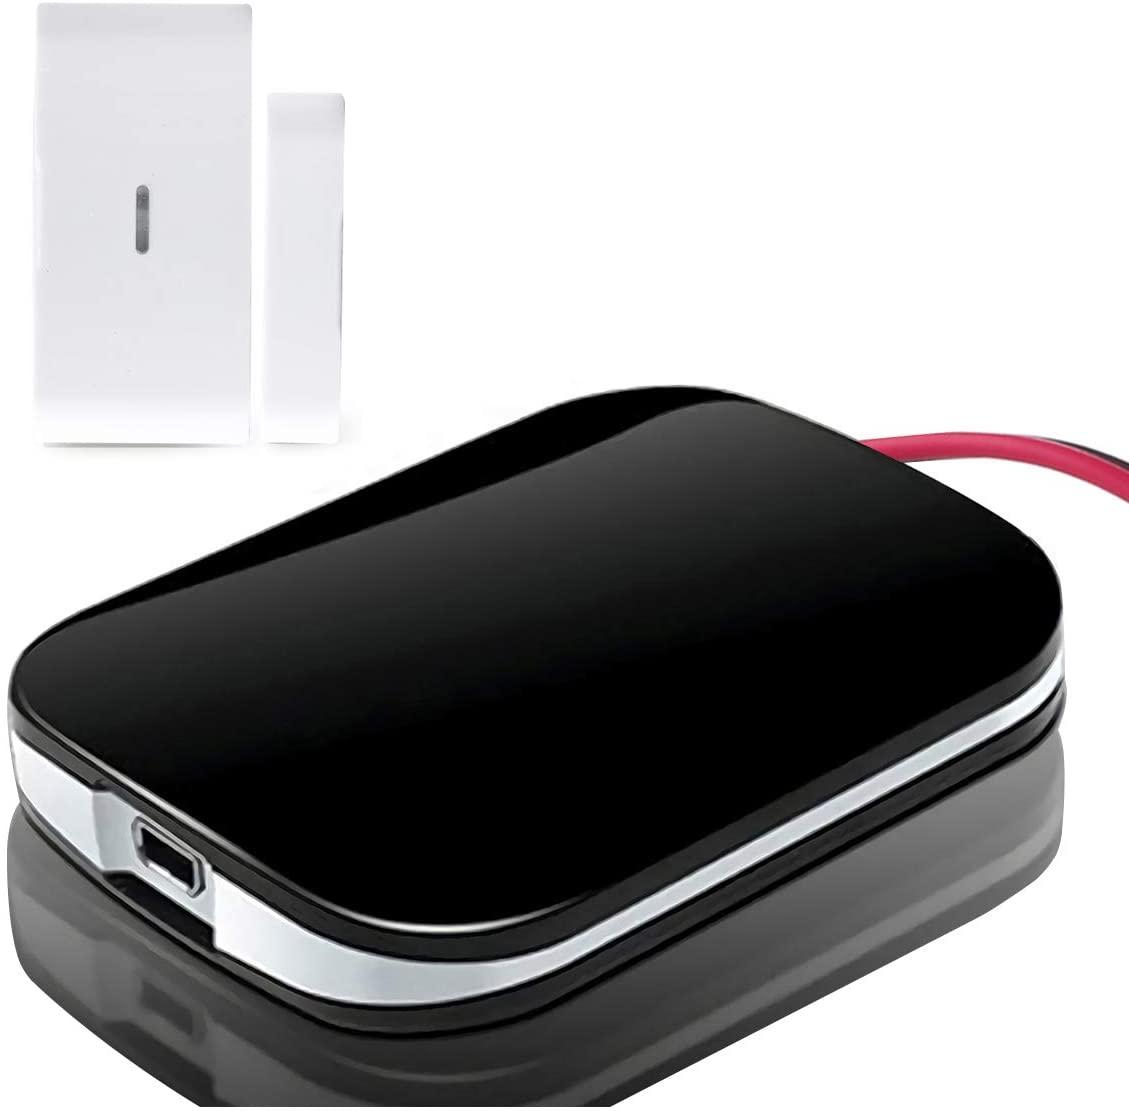 Smart Wi-Fi Garage Door Opener Remote,APP Control, Compatible with Alexa, Google Assistant, Siri, No Hub Required